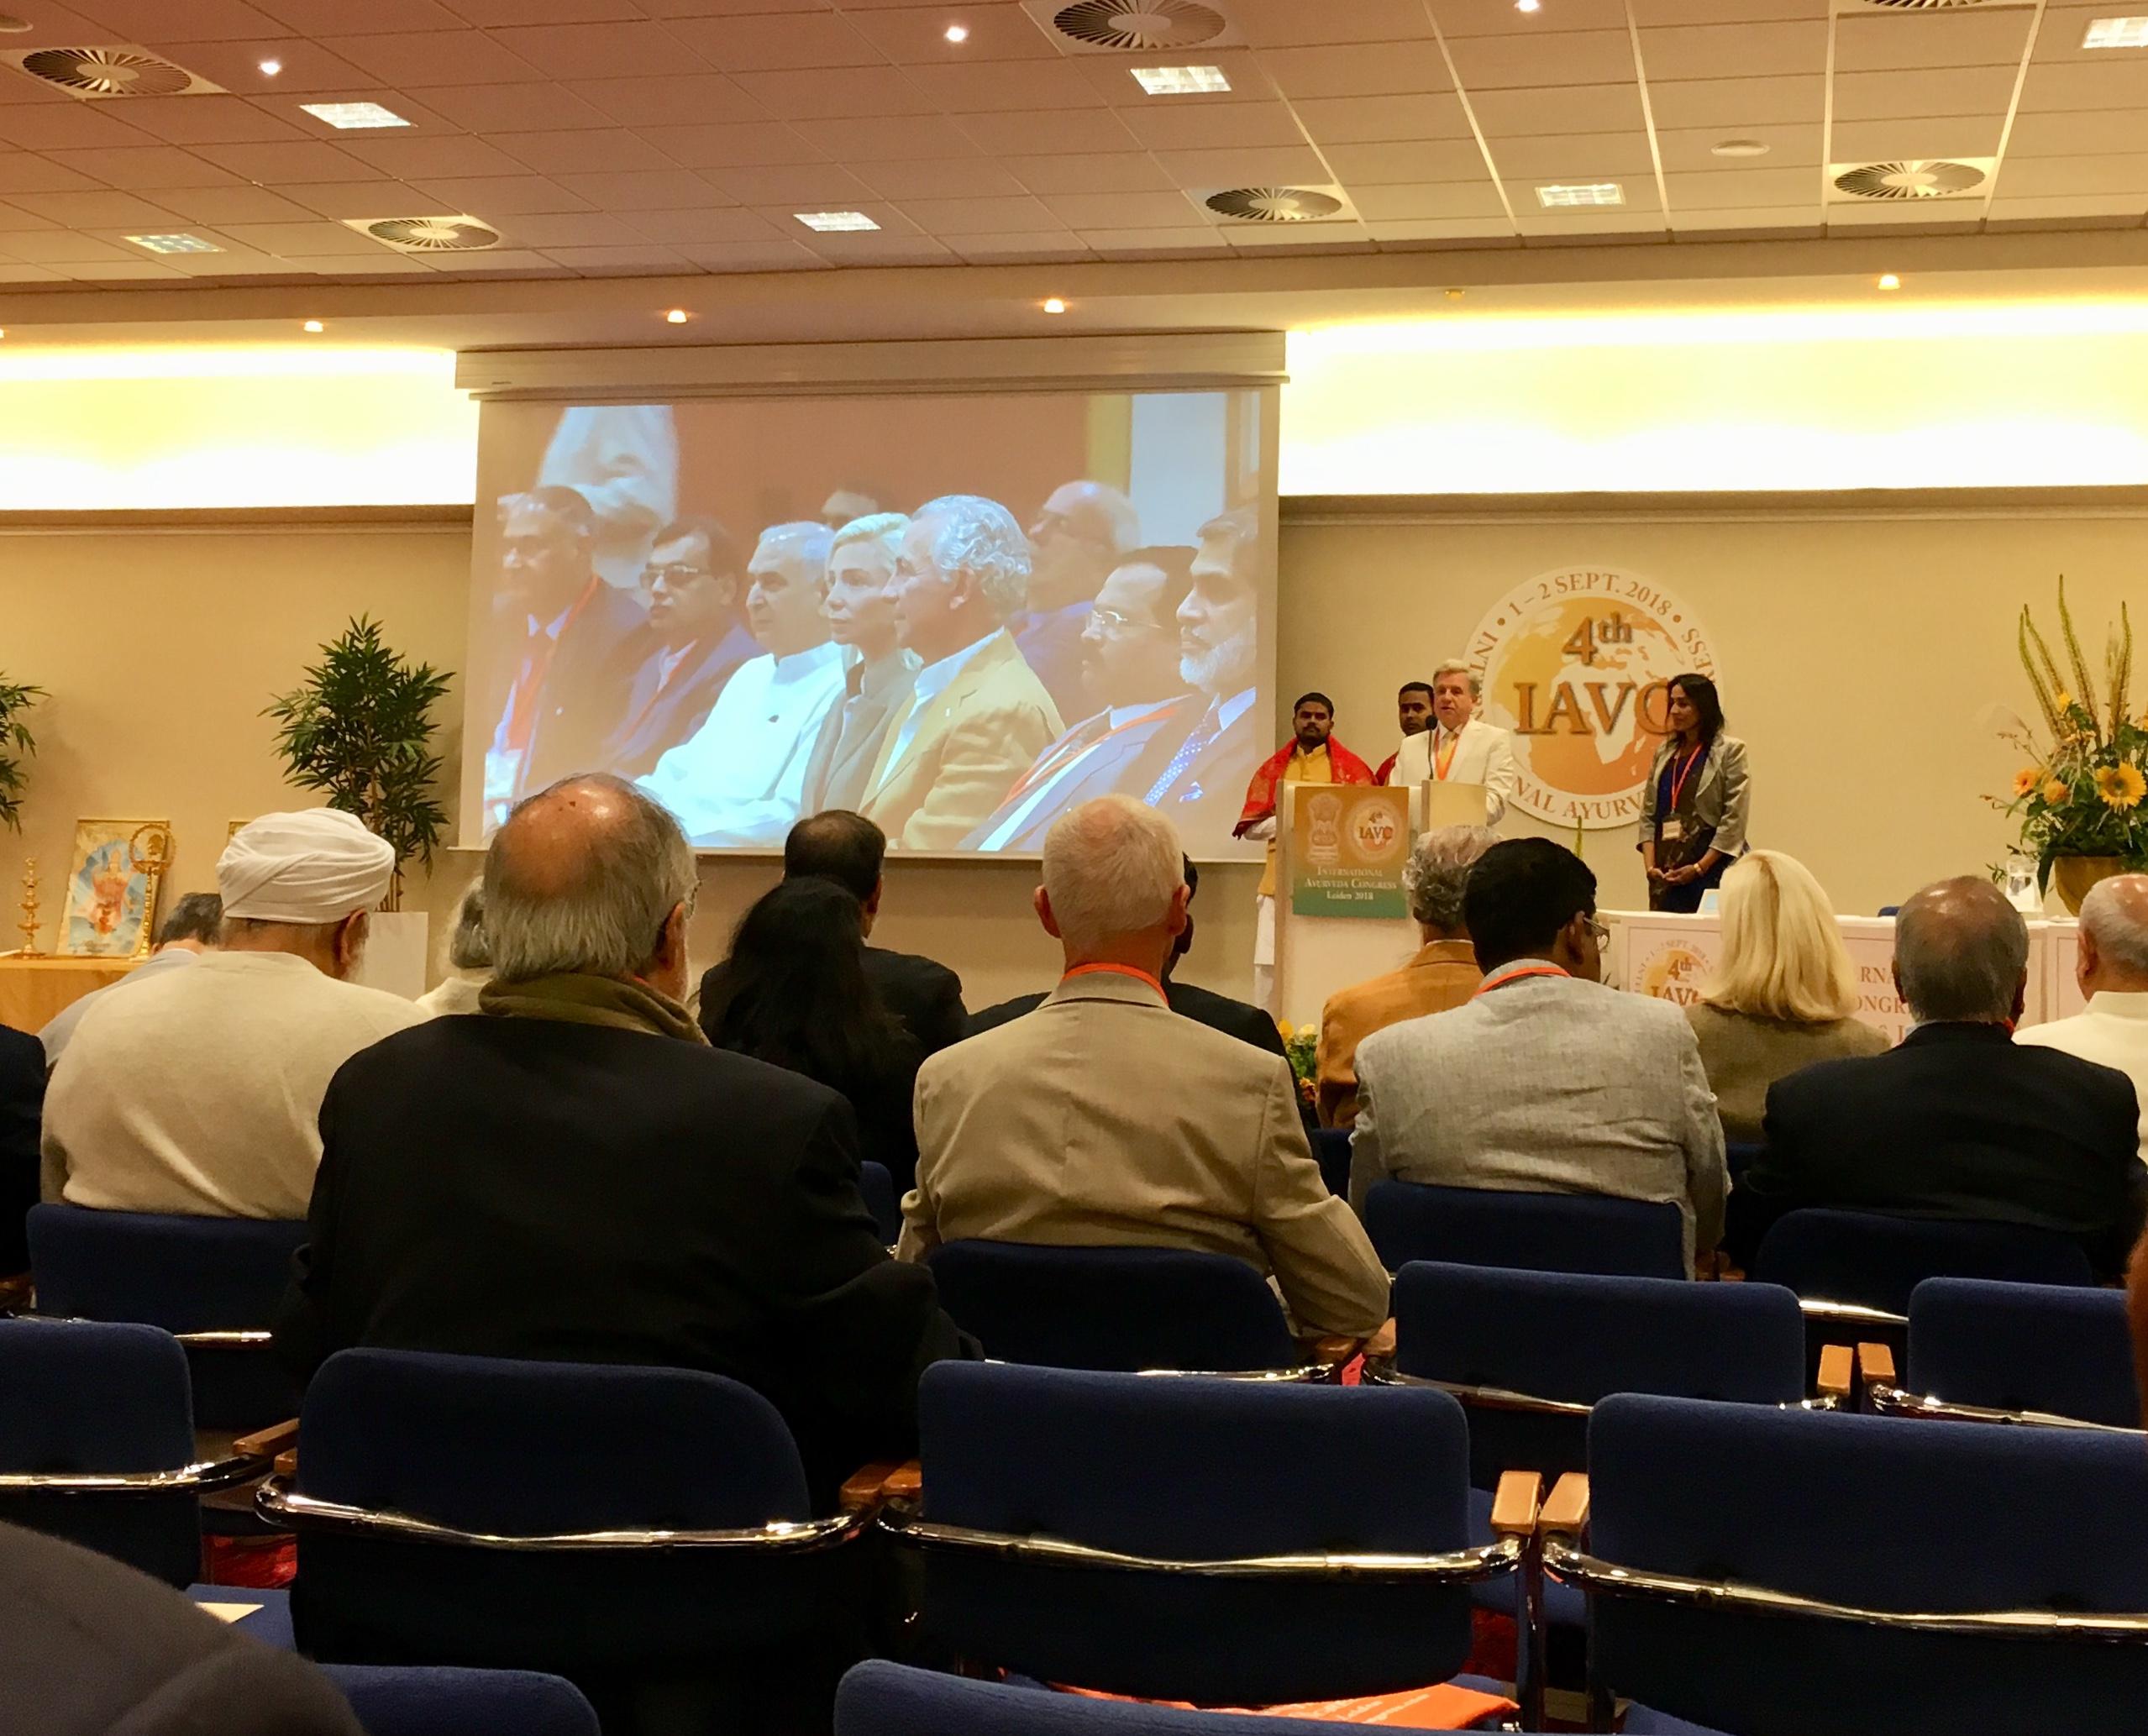 Ayur-Veda-Congres Leiden 2018 opening